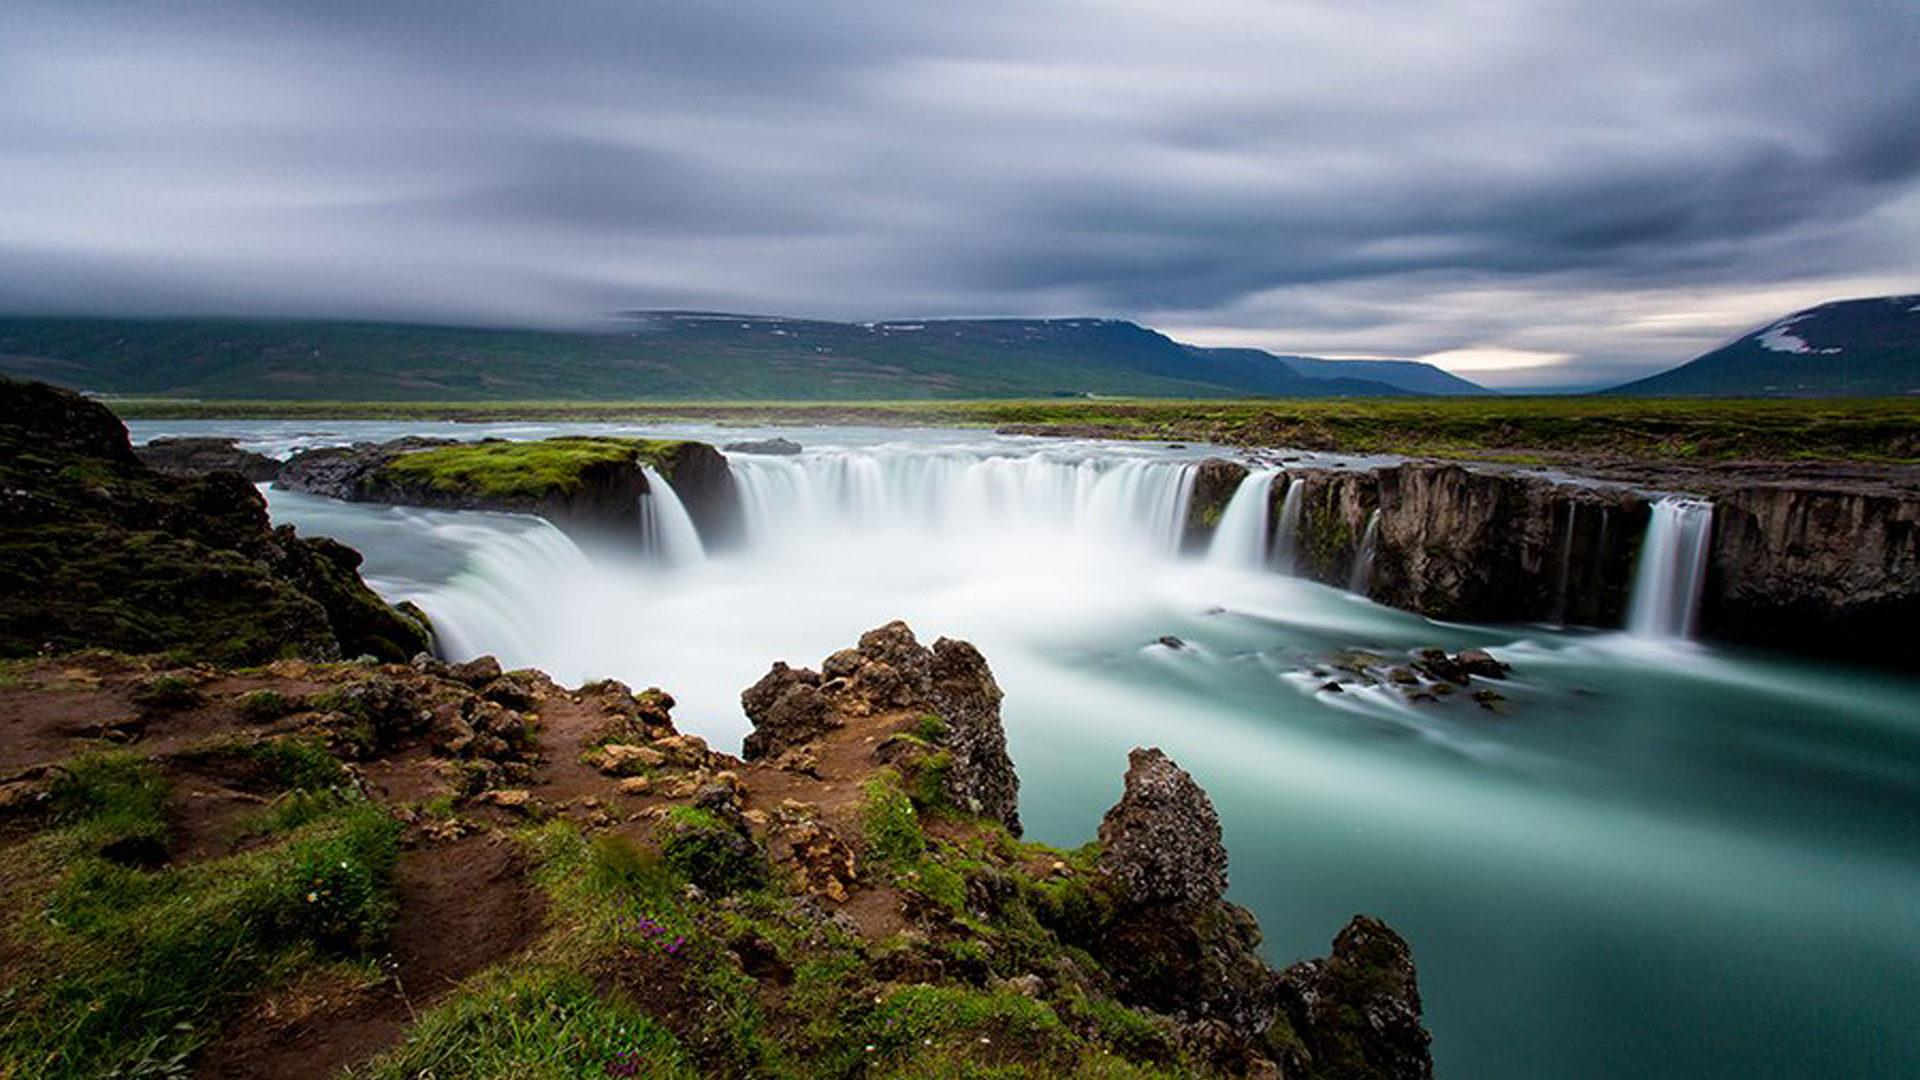 Niagara Falls Wallpaper Iphone Go 240 Afoss Falls Iceland Full Hd Wallpapers 1920x1200